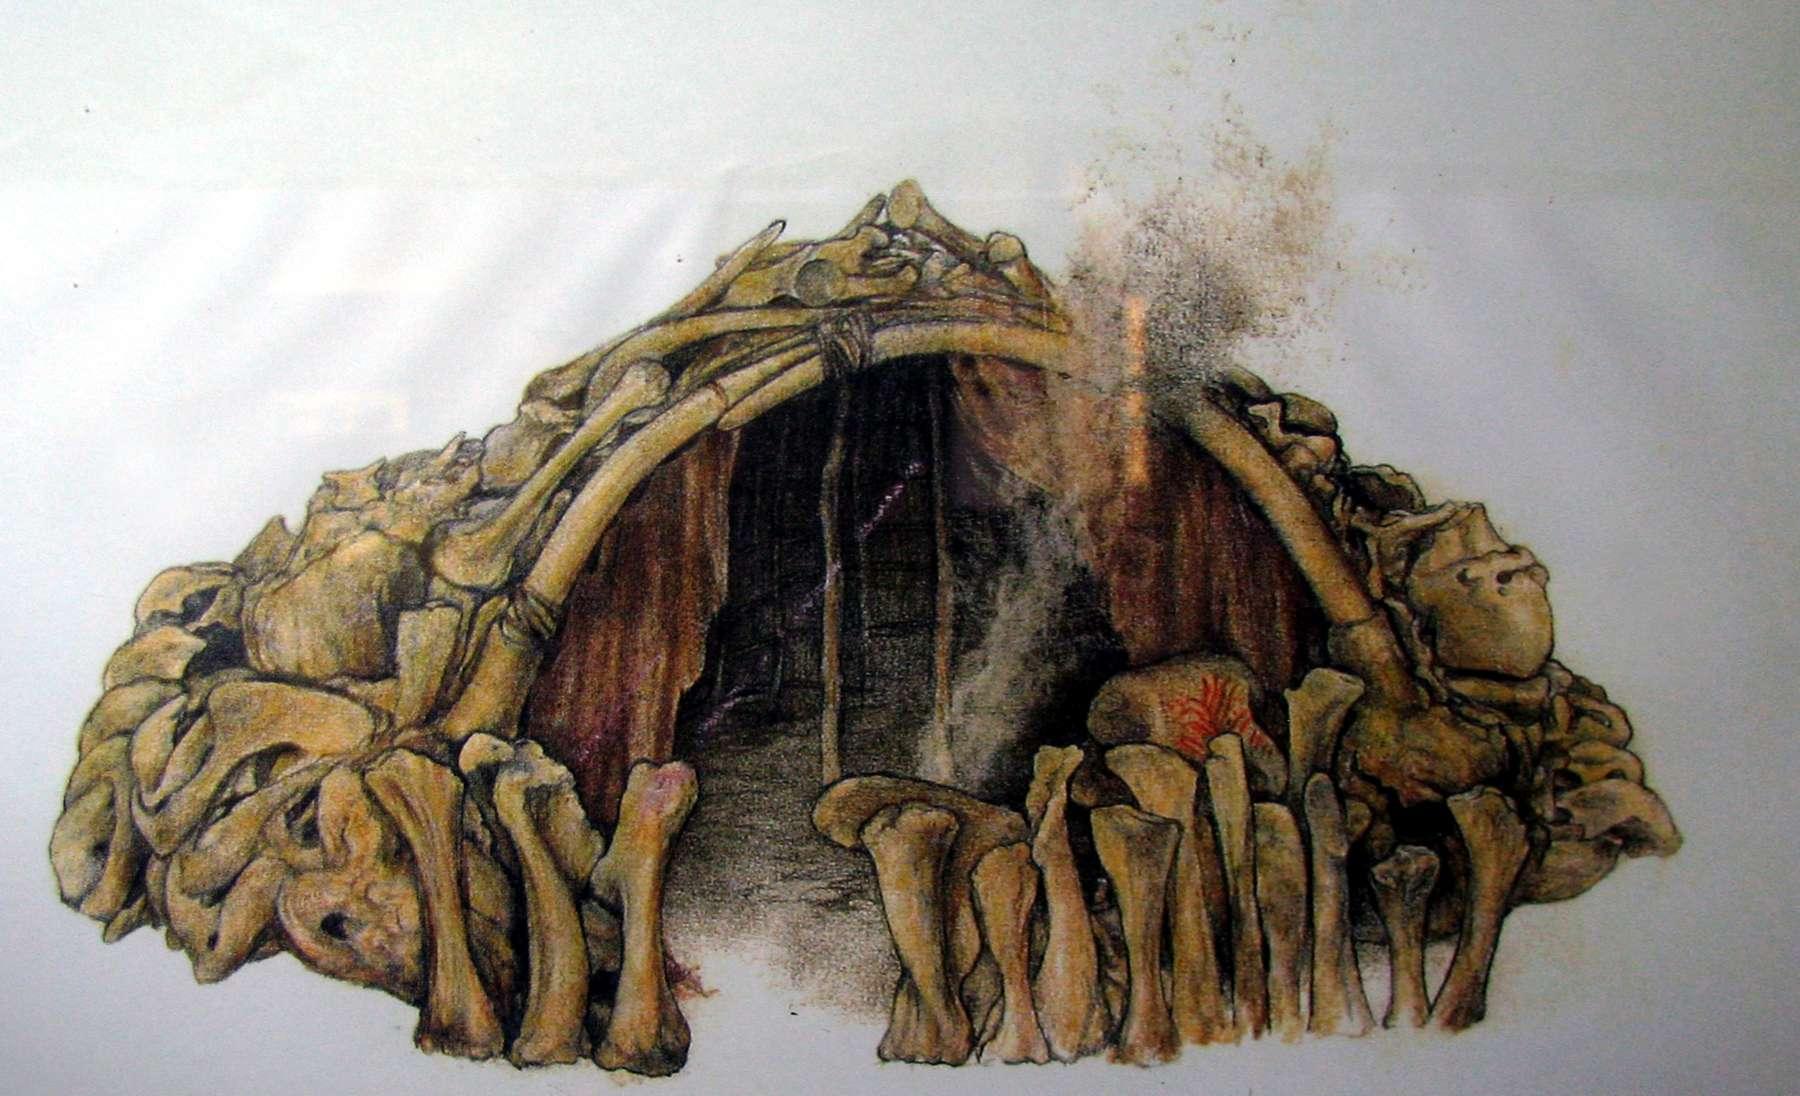 Mezhirich Mezhyrich Mejiritch Mammoth Camp Wiring Diagram Bone Hut